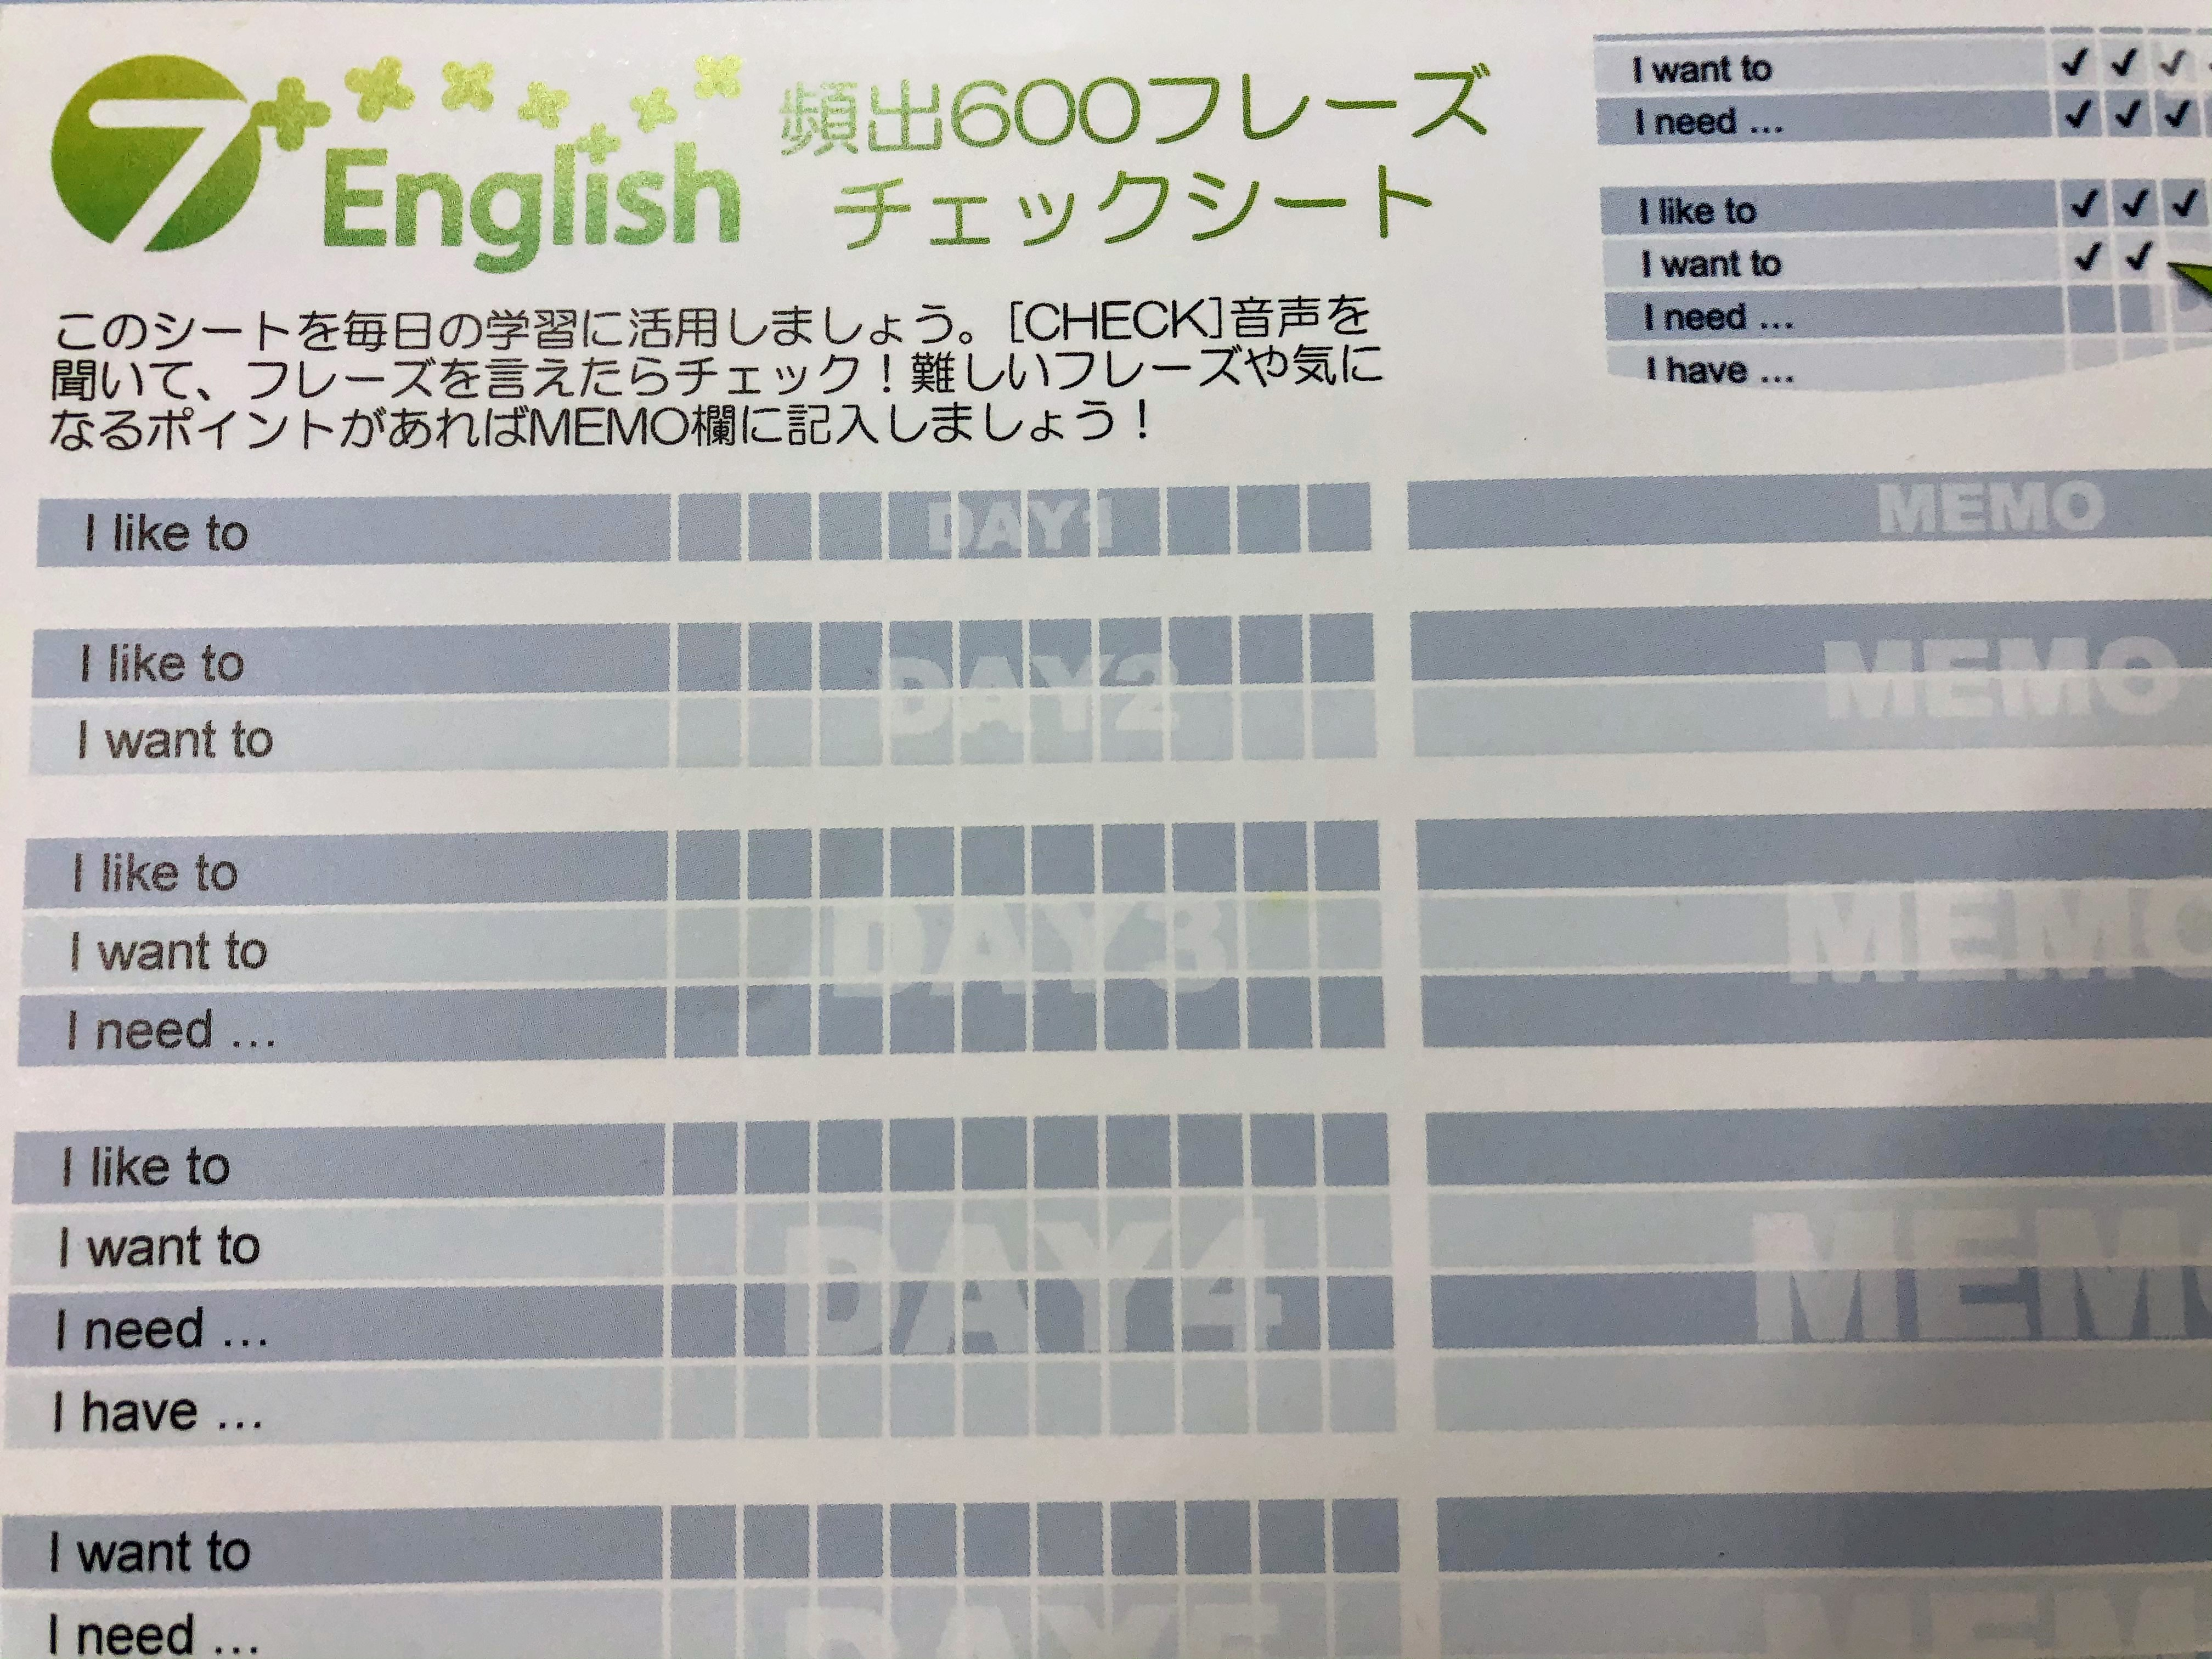 7+Englishシート